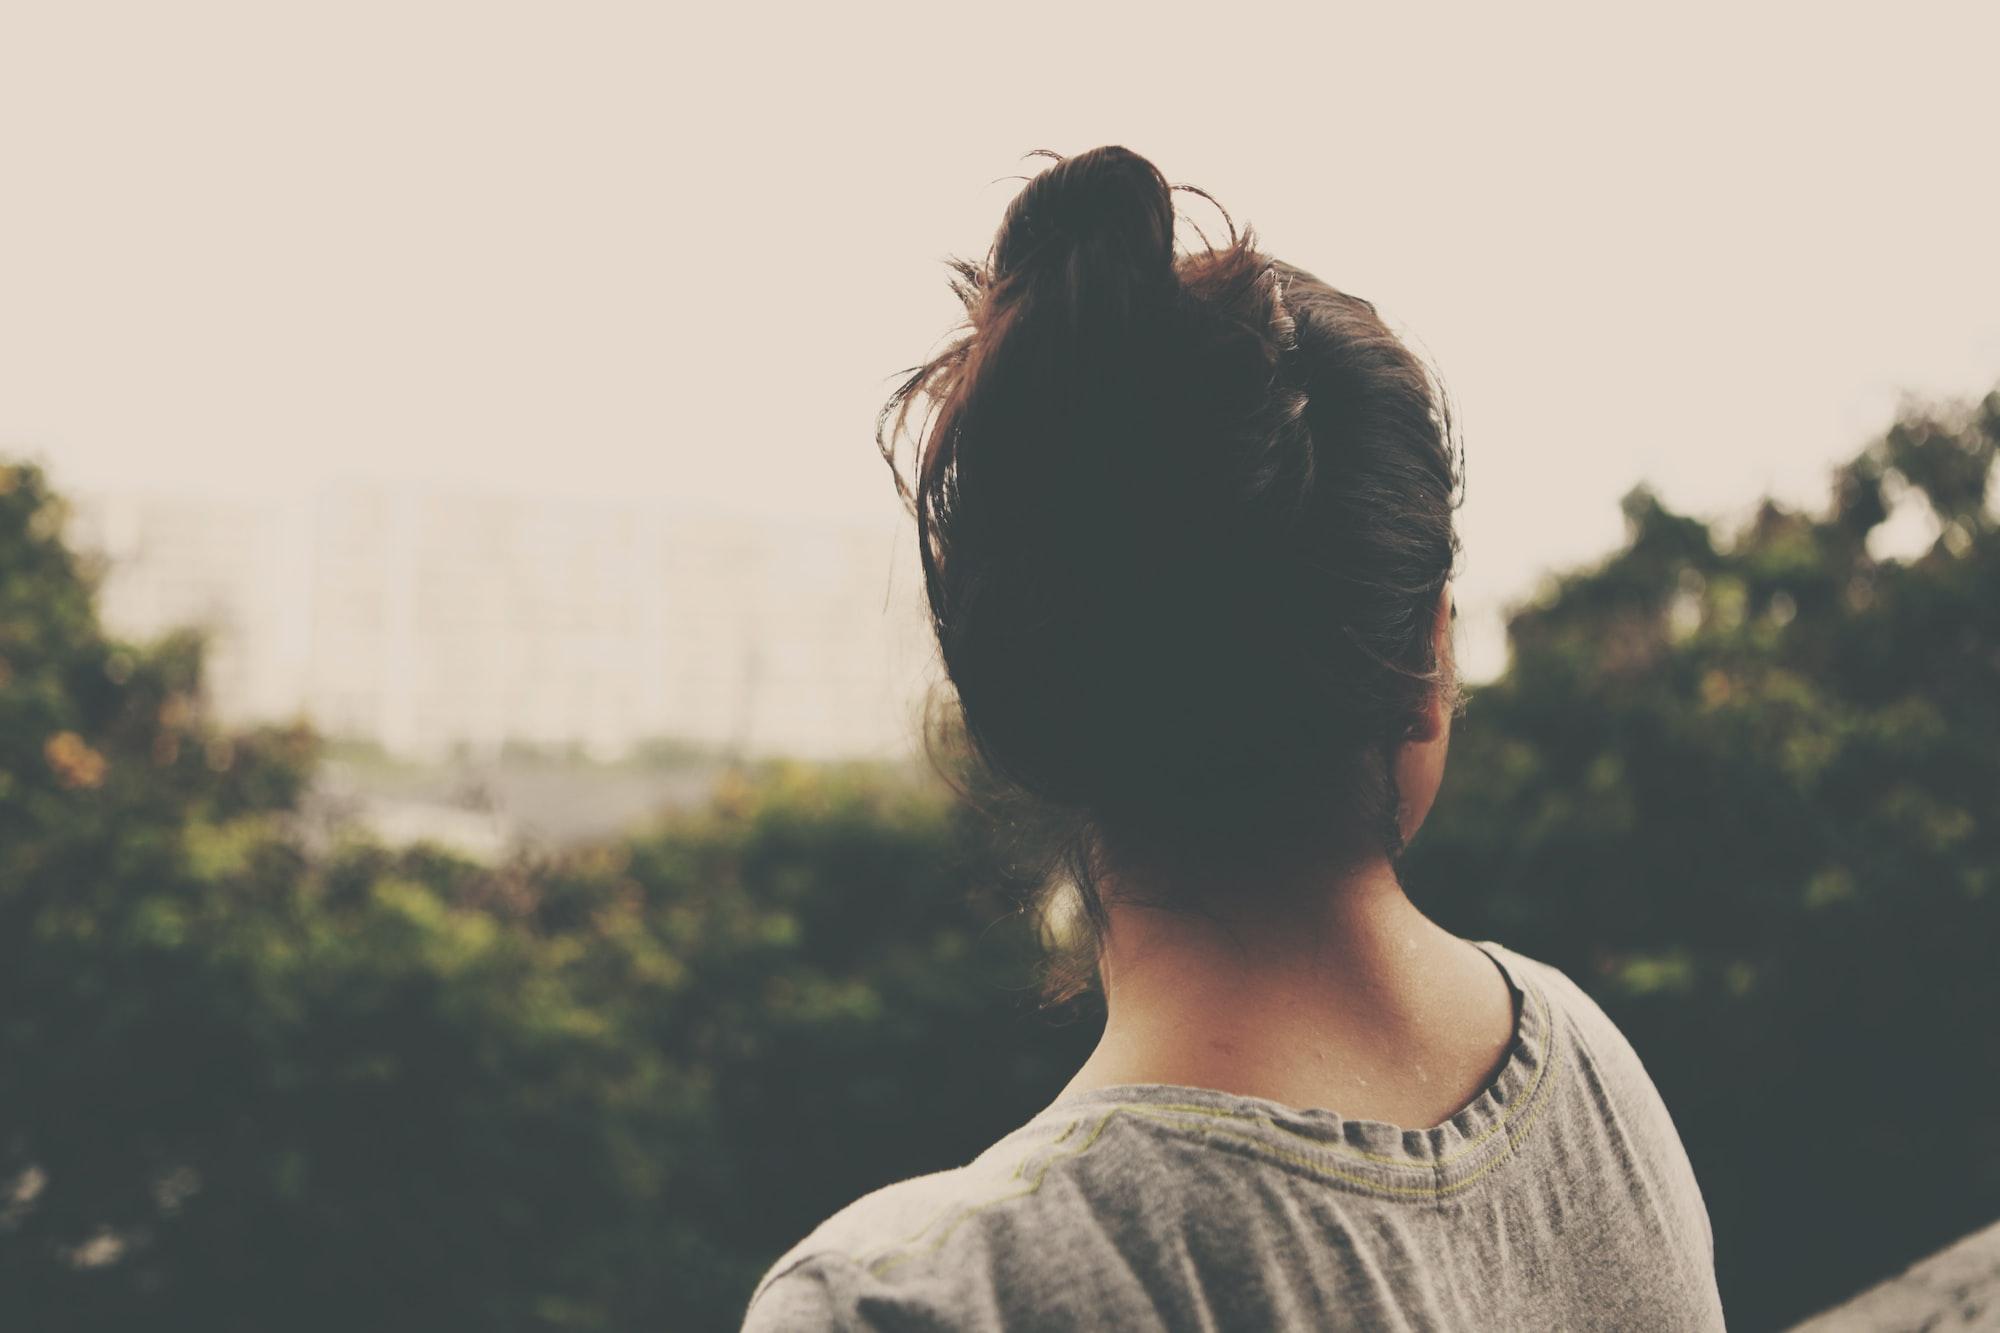 Back shot of a woman with dark hair in a bun, wearing a grey shirt.